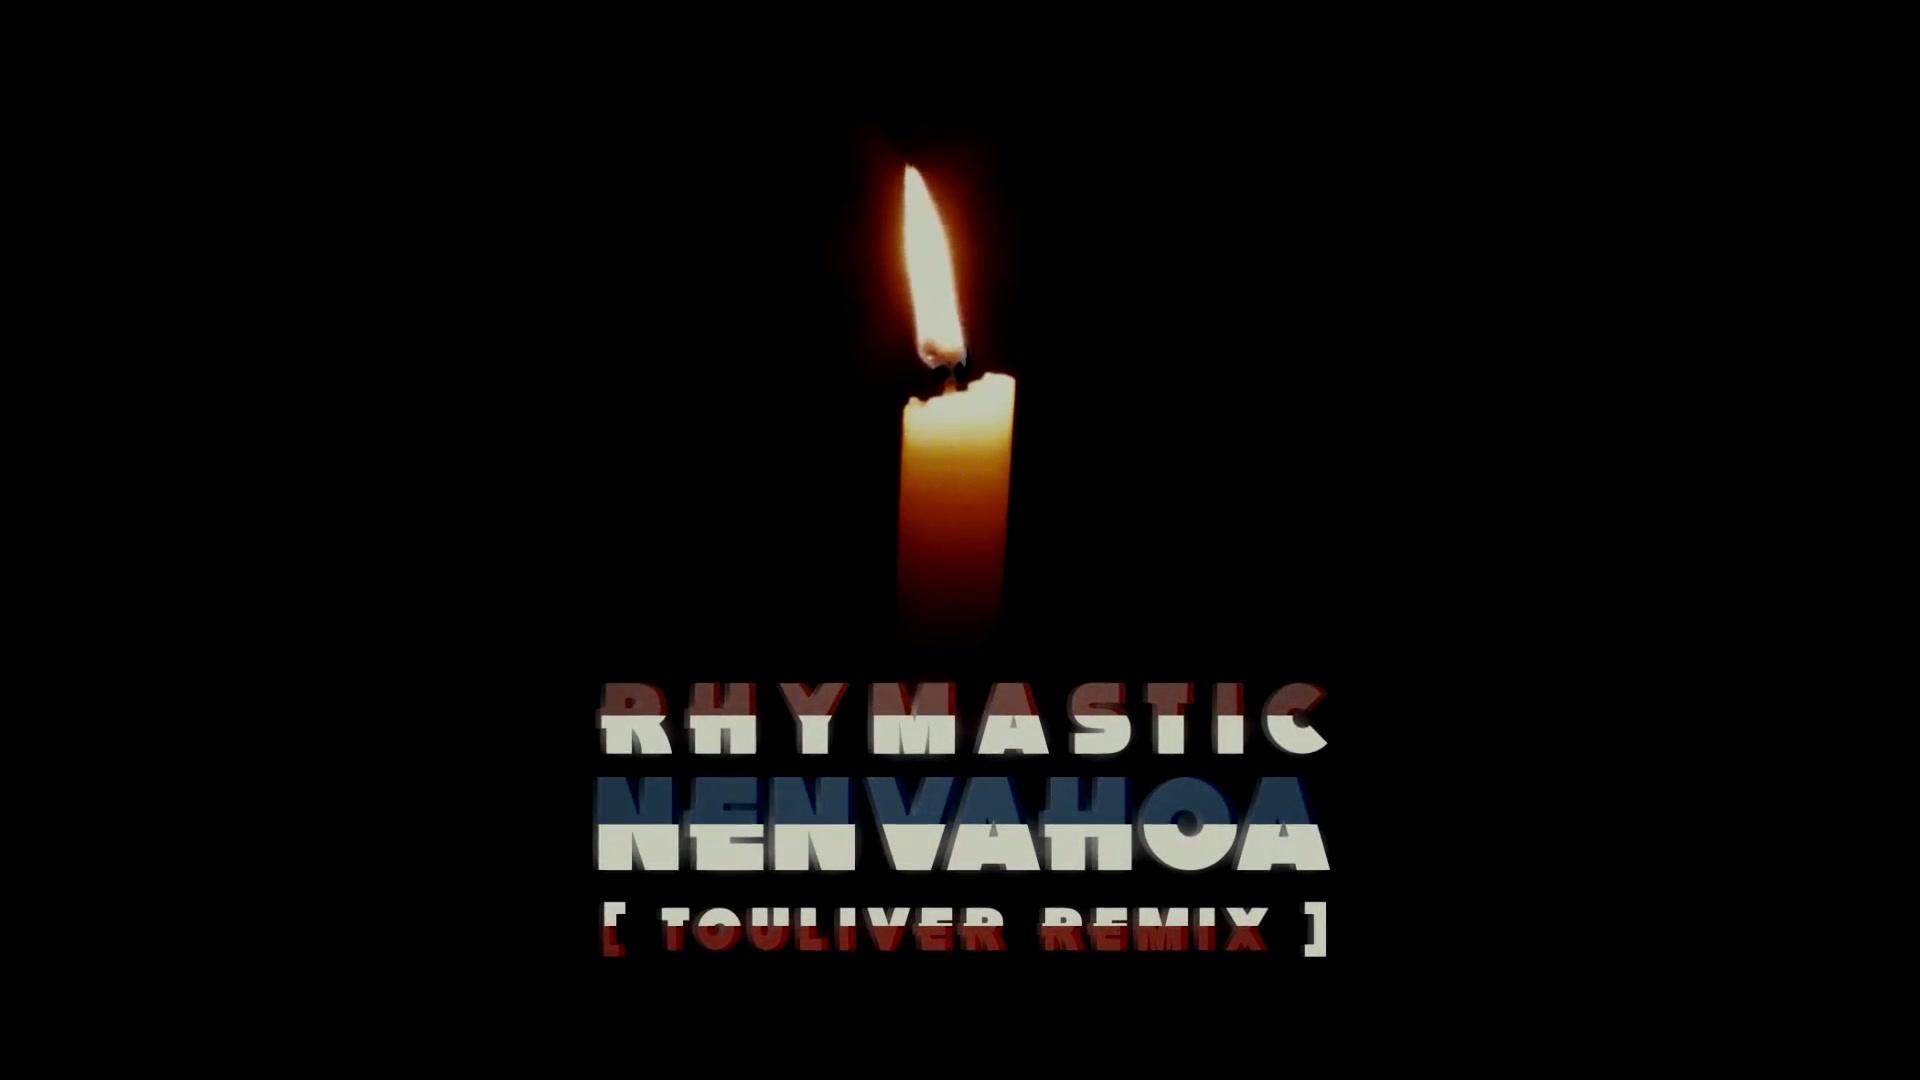 Nến Và Hoa (Touliver Remix) - Touliver, Rhymastic